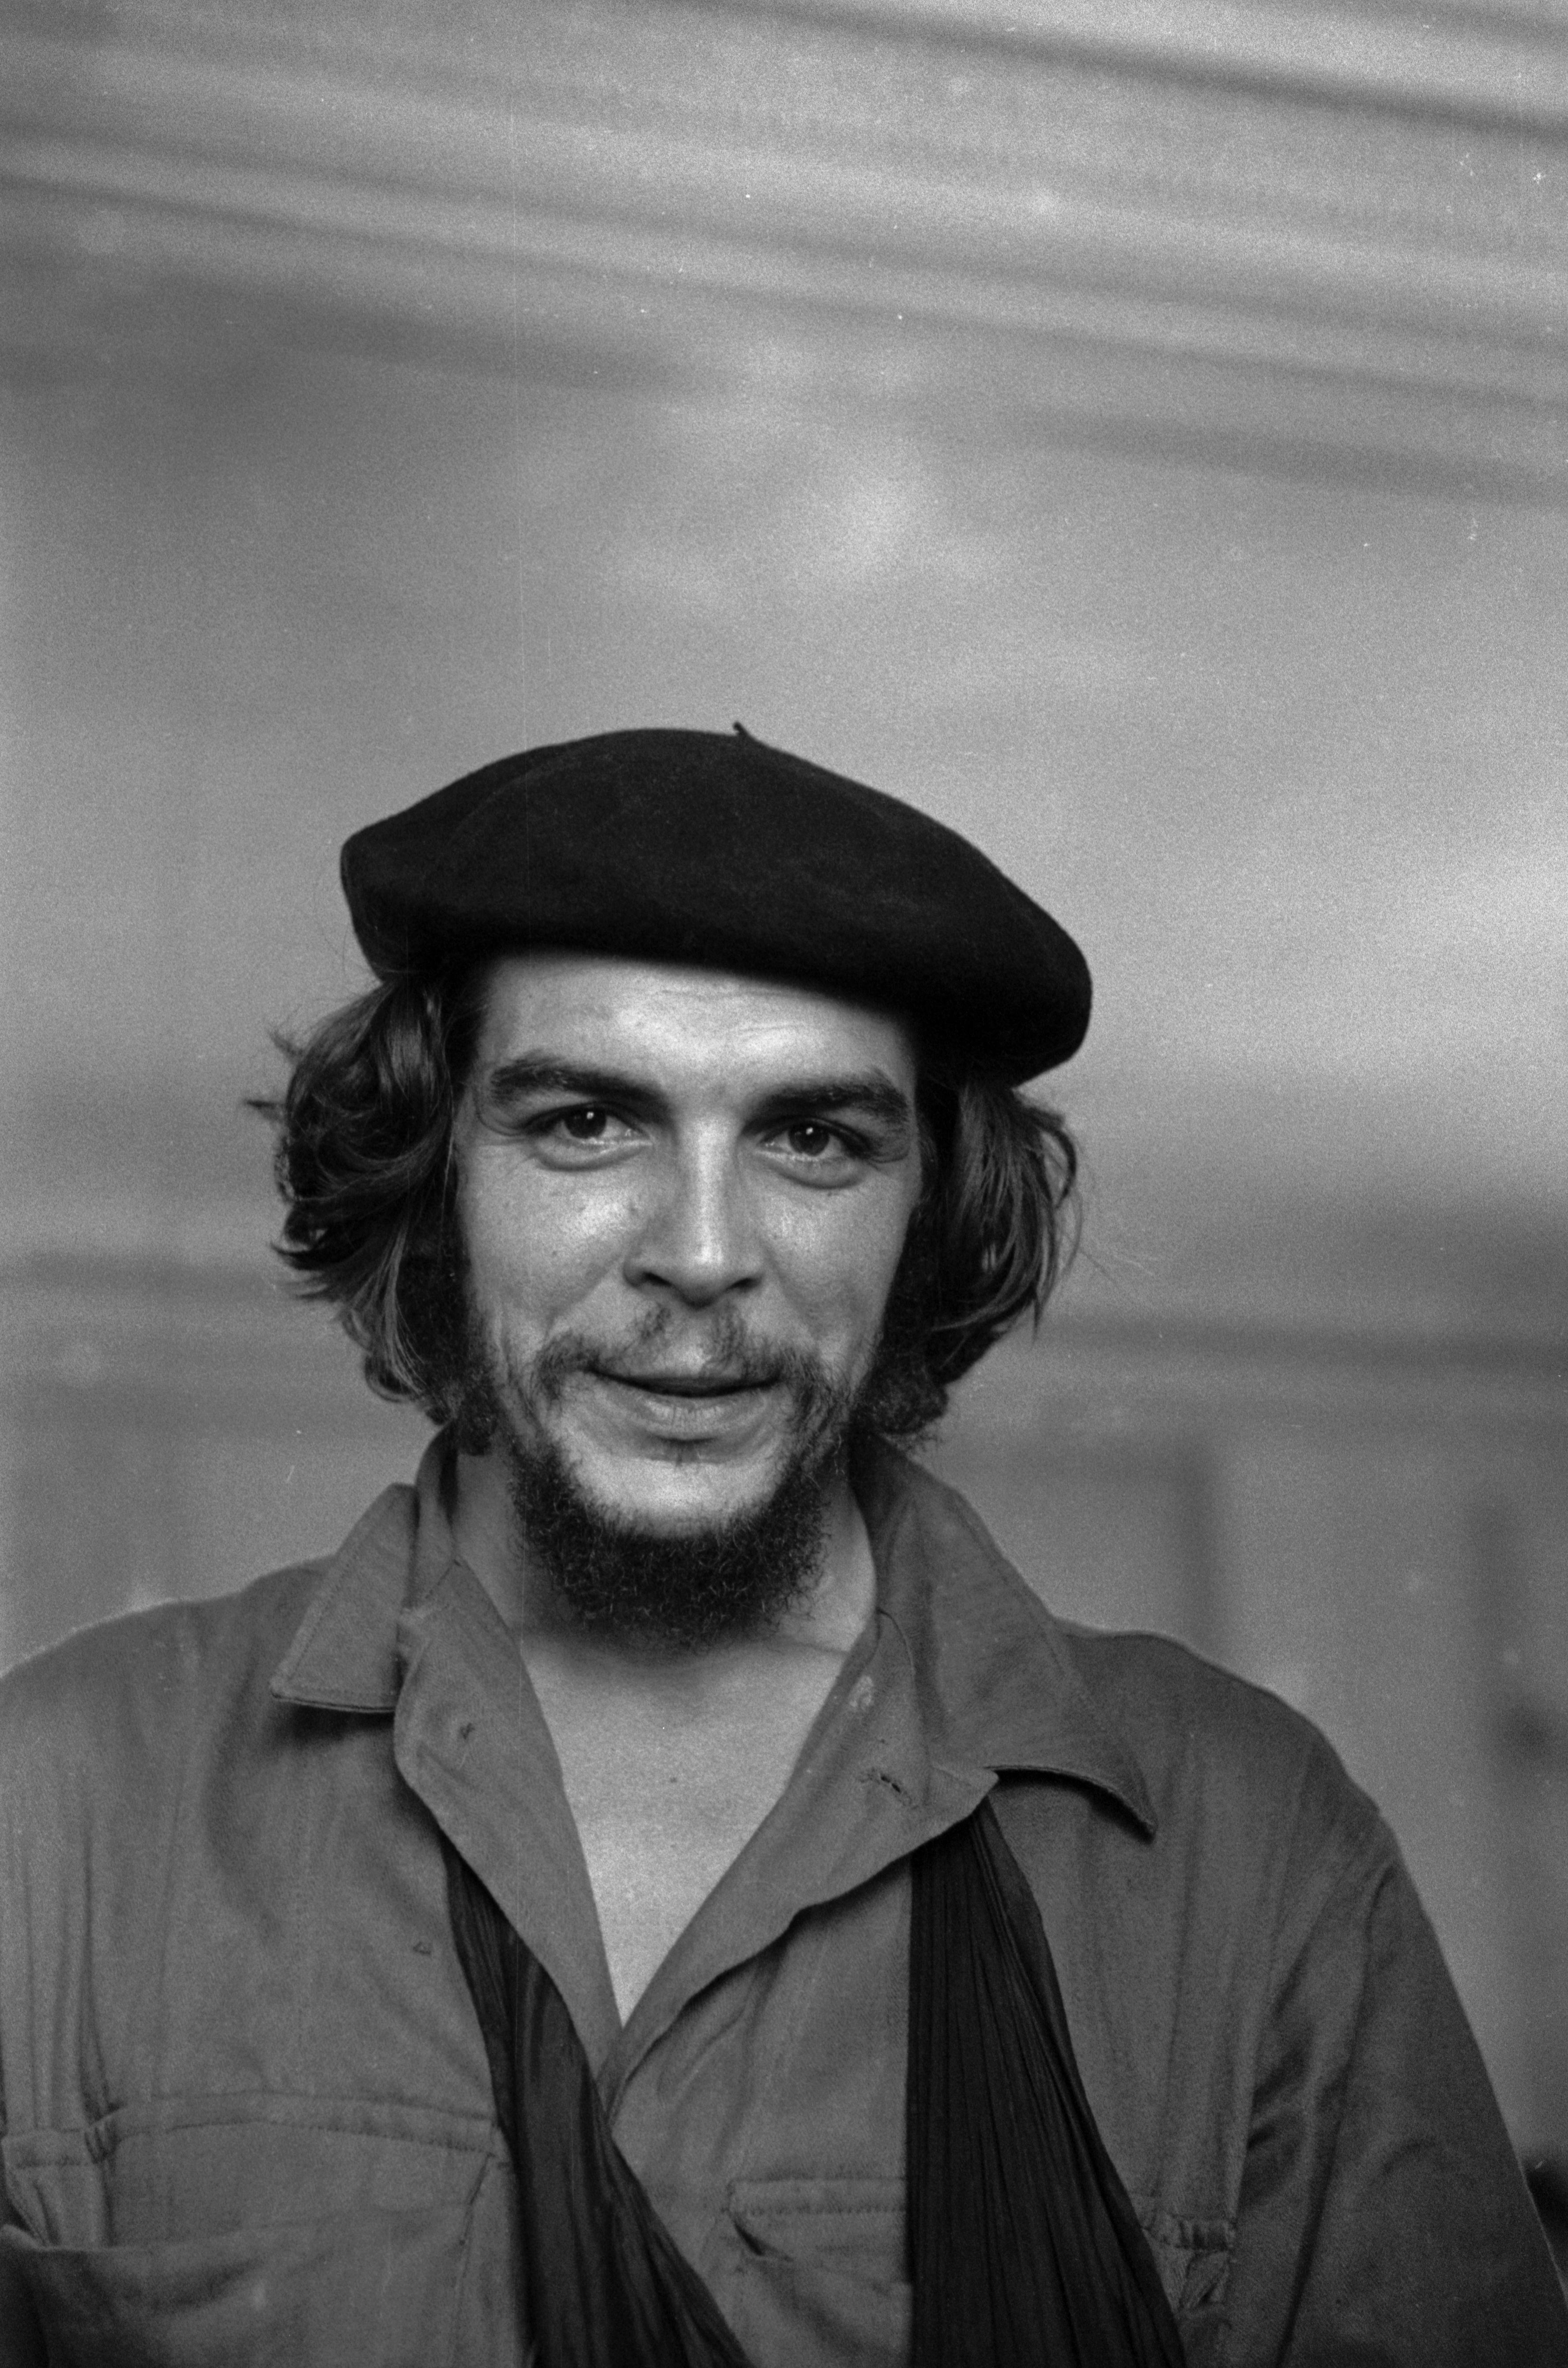 Argentinian-born Cuban revolutionary Ernesto Che Guevara. Havana, Cuba, January 7, 1959.